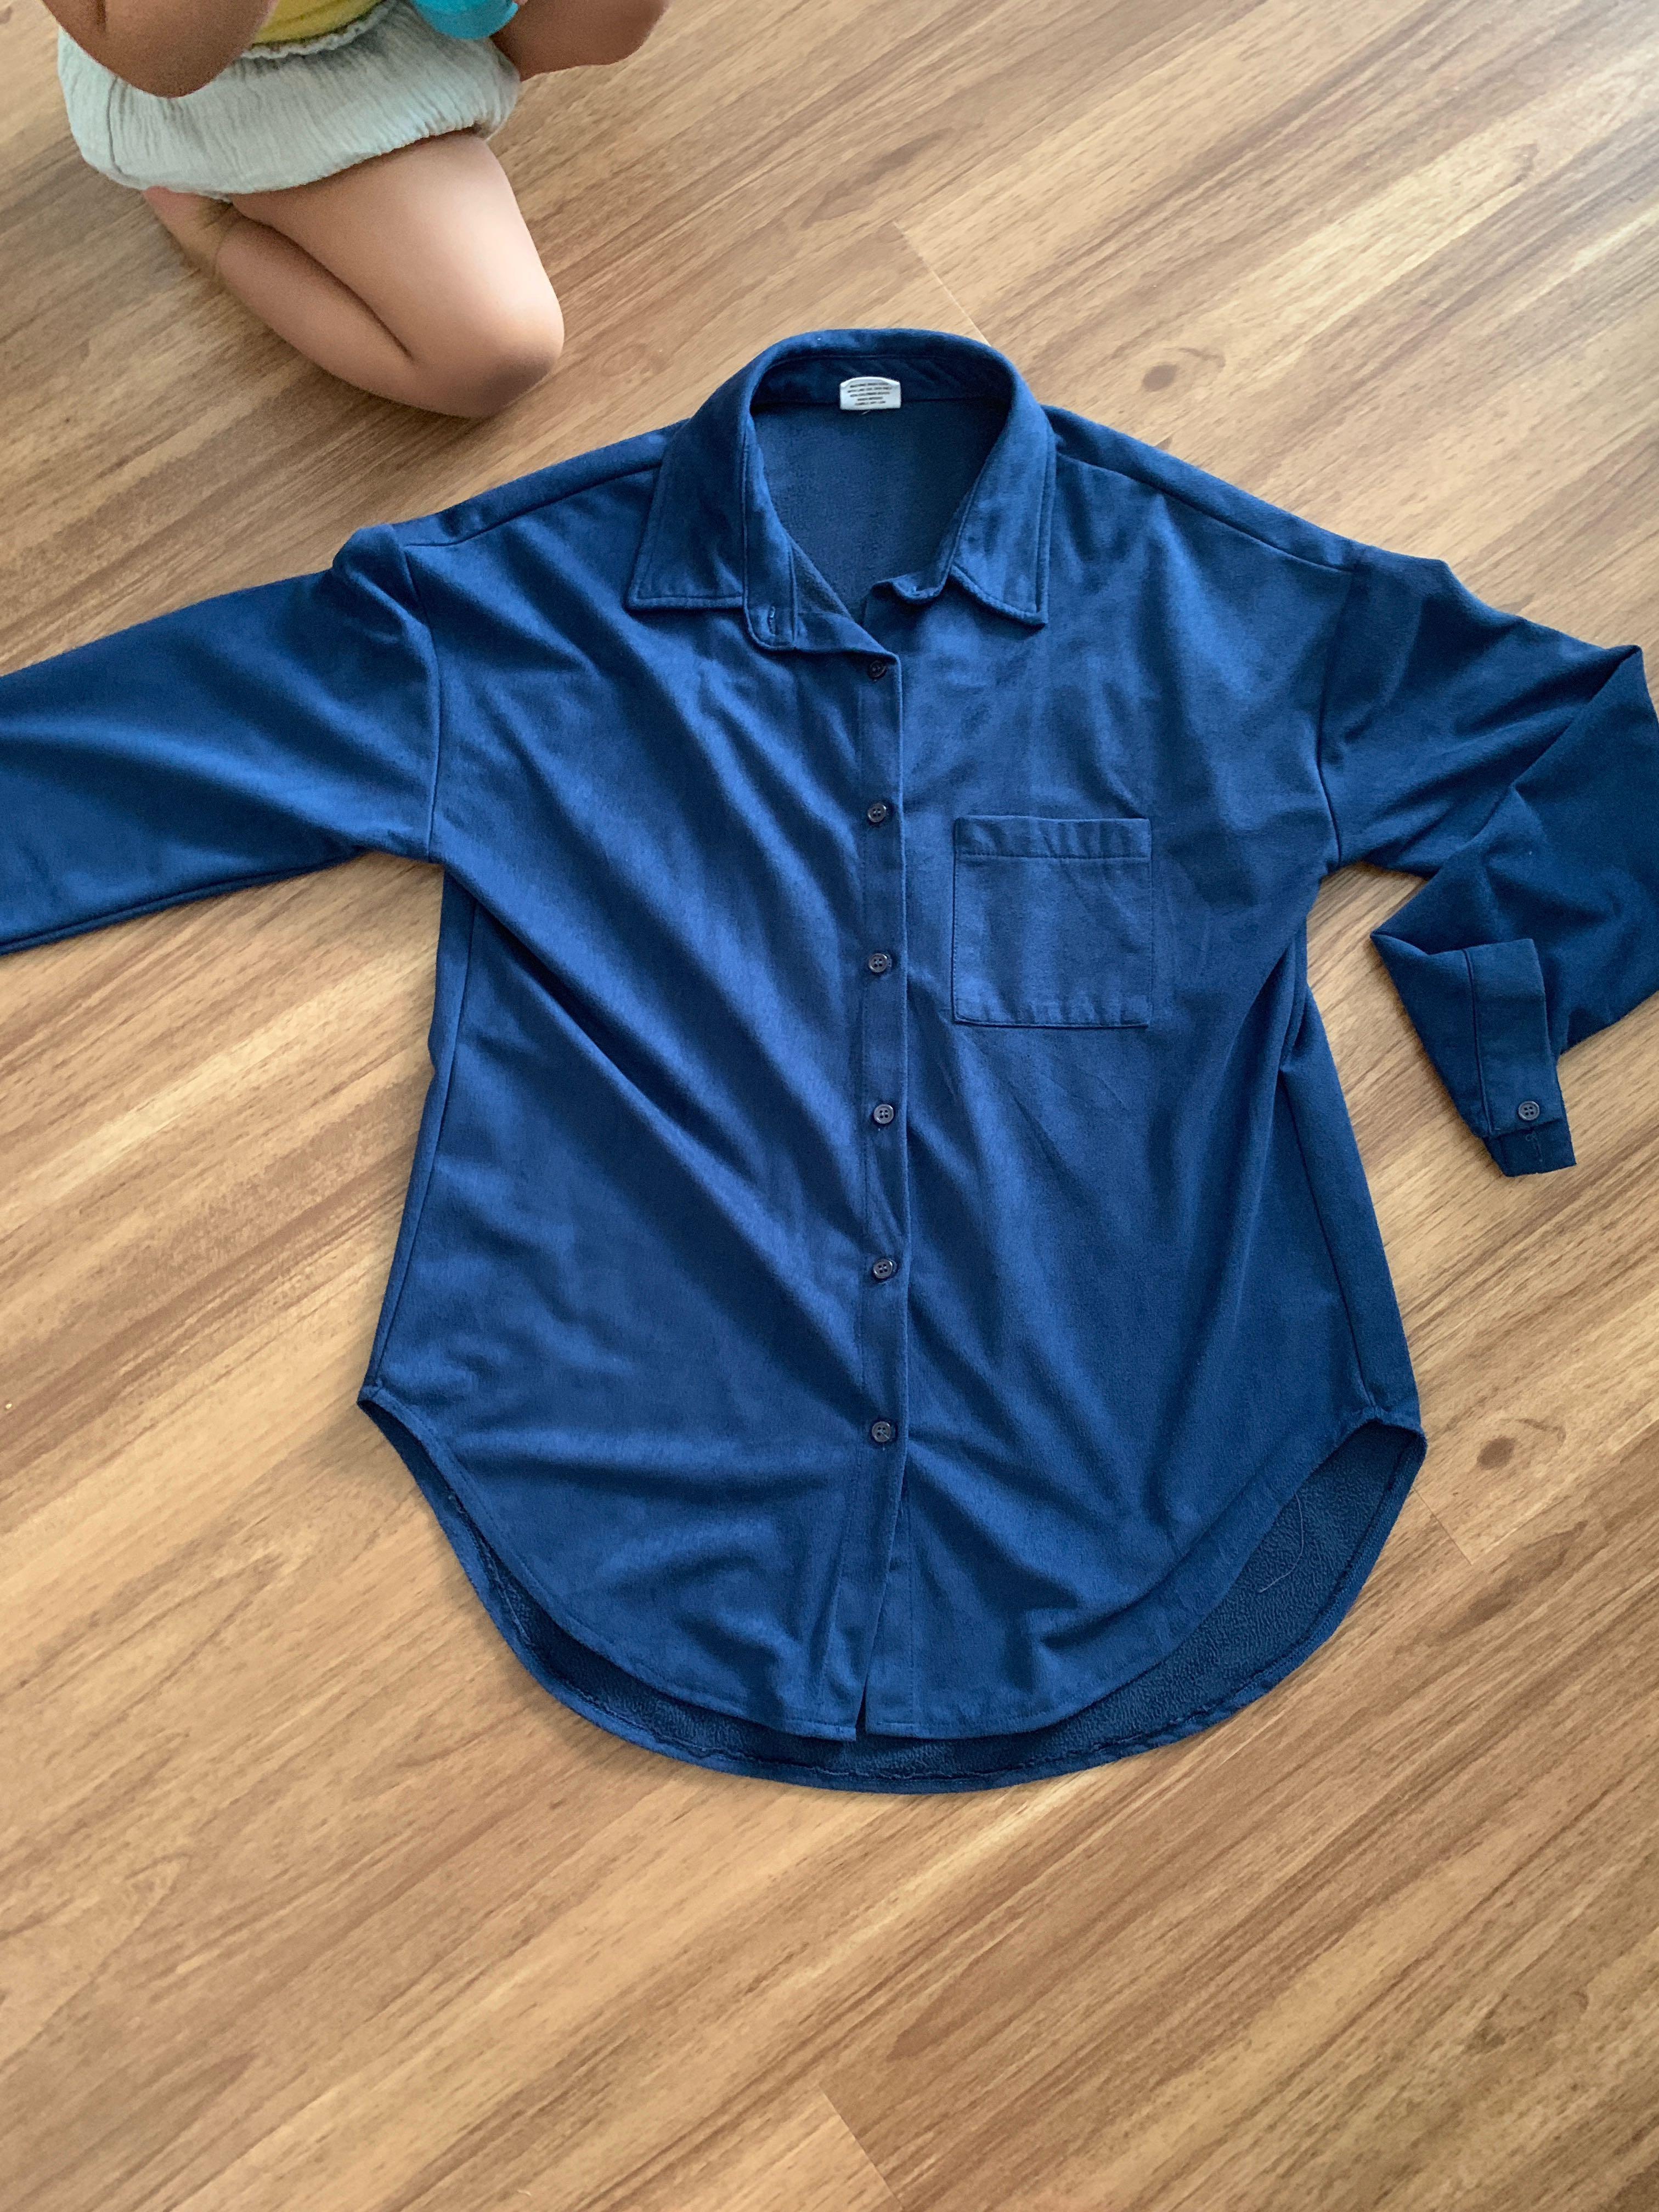 d7214947fa9 Velvet long sleeve shirt not uniqlo love Bonito collate